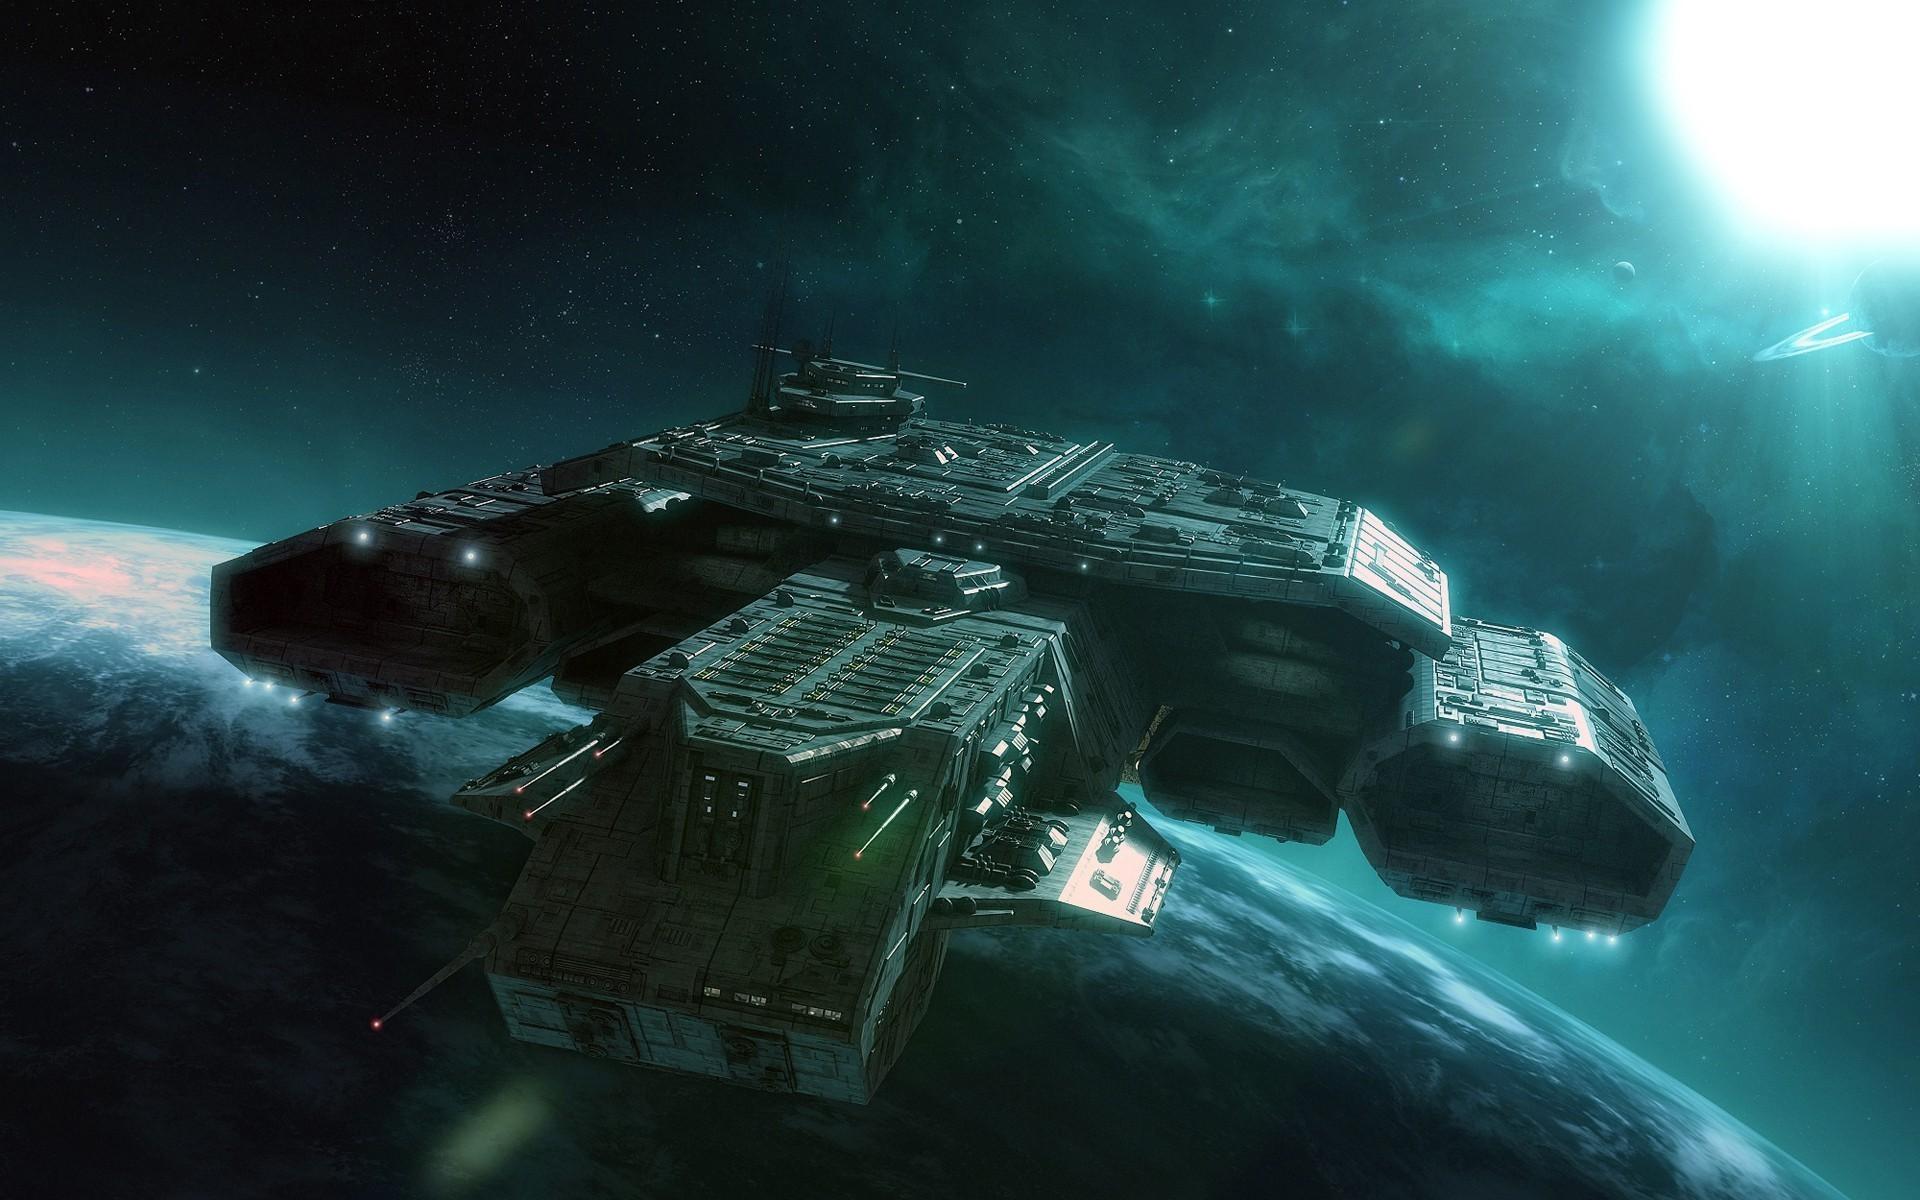 Stargate Wallpaper Hd 66 Images